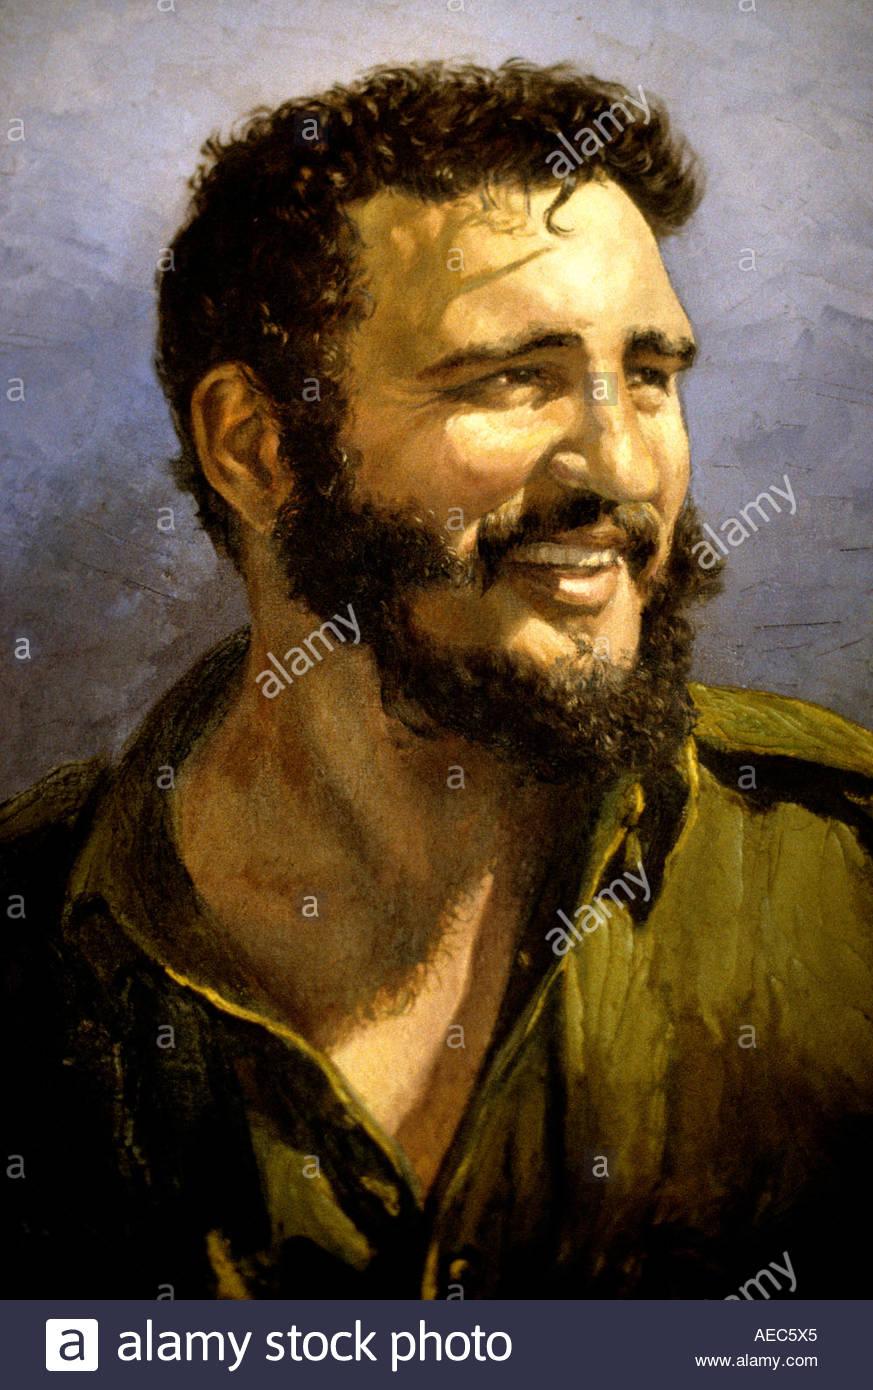 fidel-alejandro-castro-ruz-cuba-cuban-historic-history-havana-AEC5X5.jpg